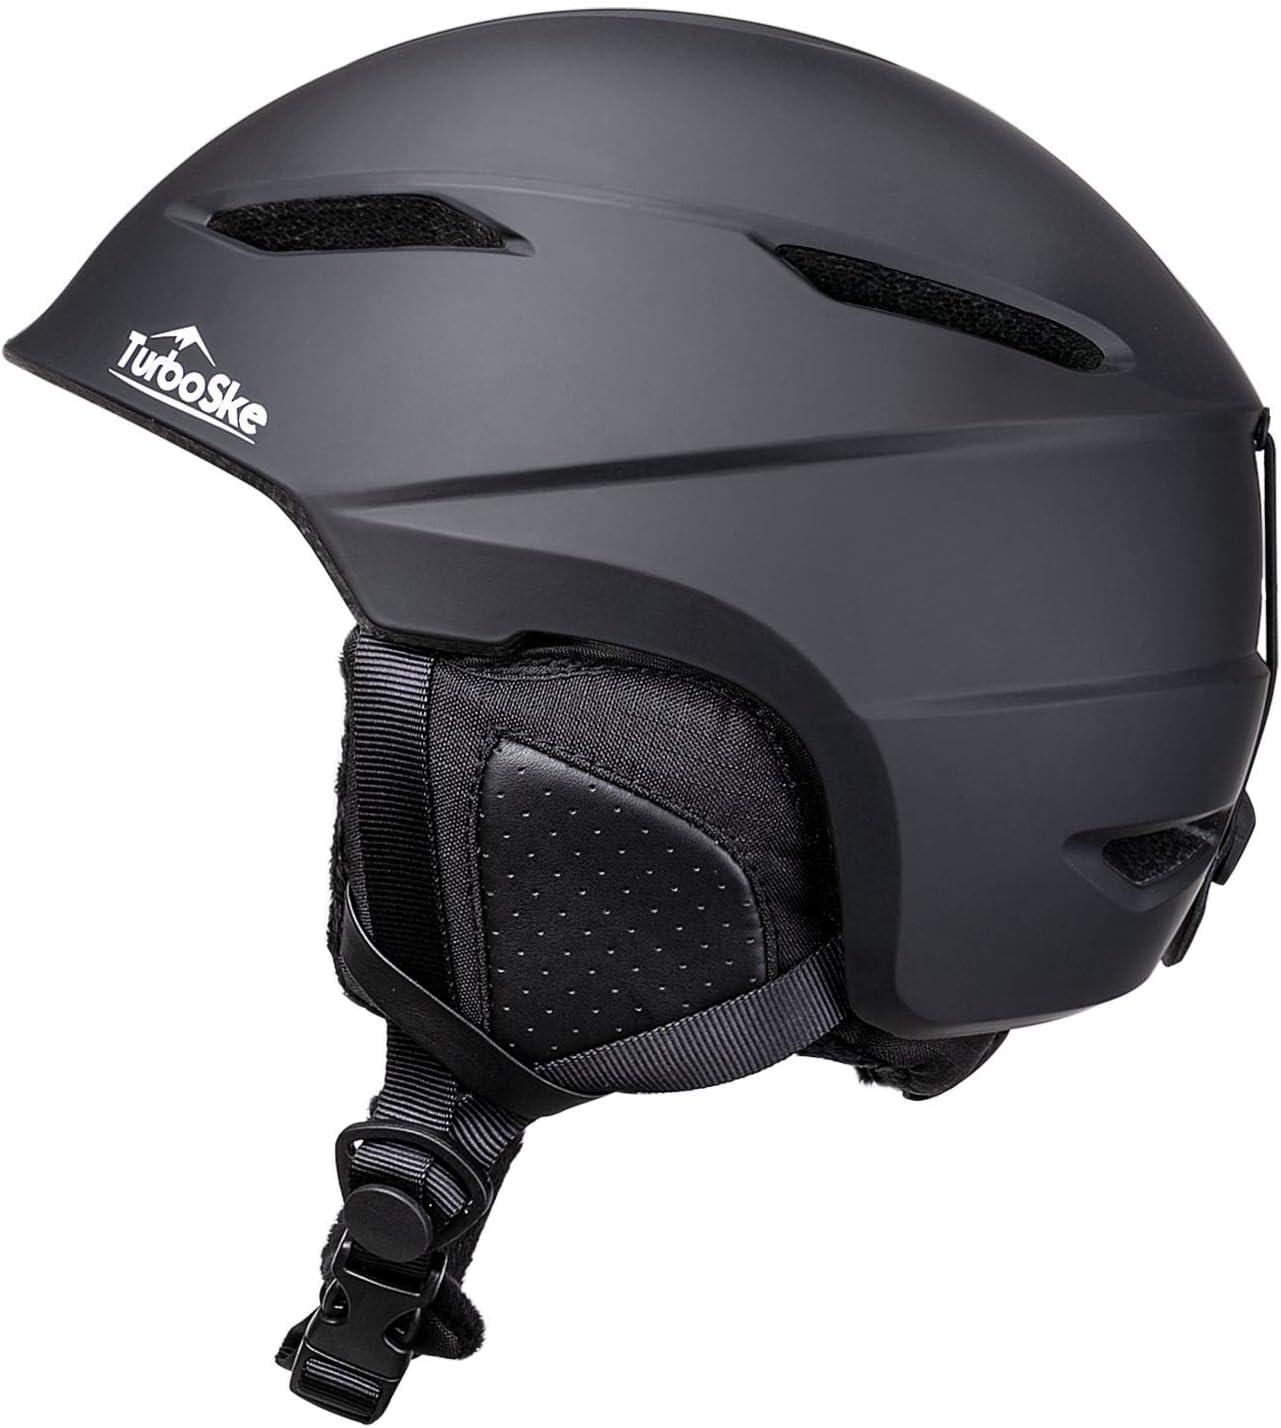 TurboSke Ski Helmet Women and Youth Snowboard Helmet Snow Sports Helmet ASTM Certified Helmet for Men Audio Compatible and Lightweight